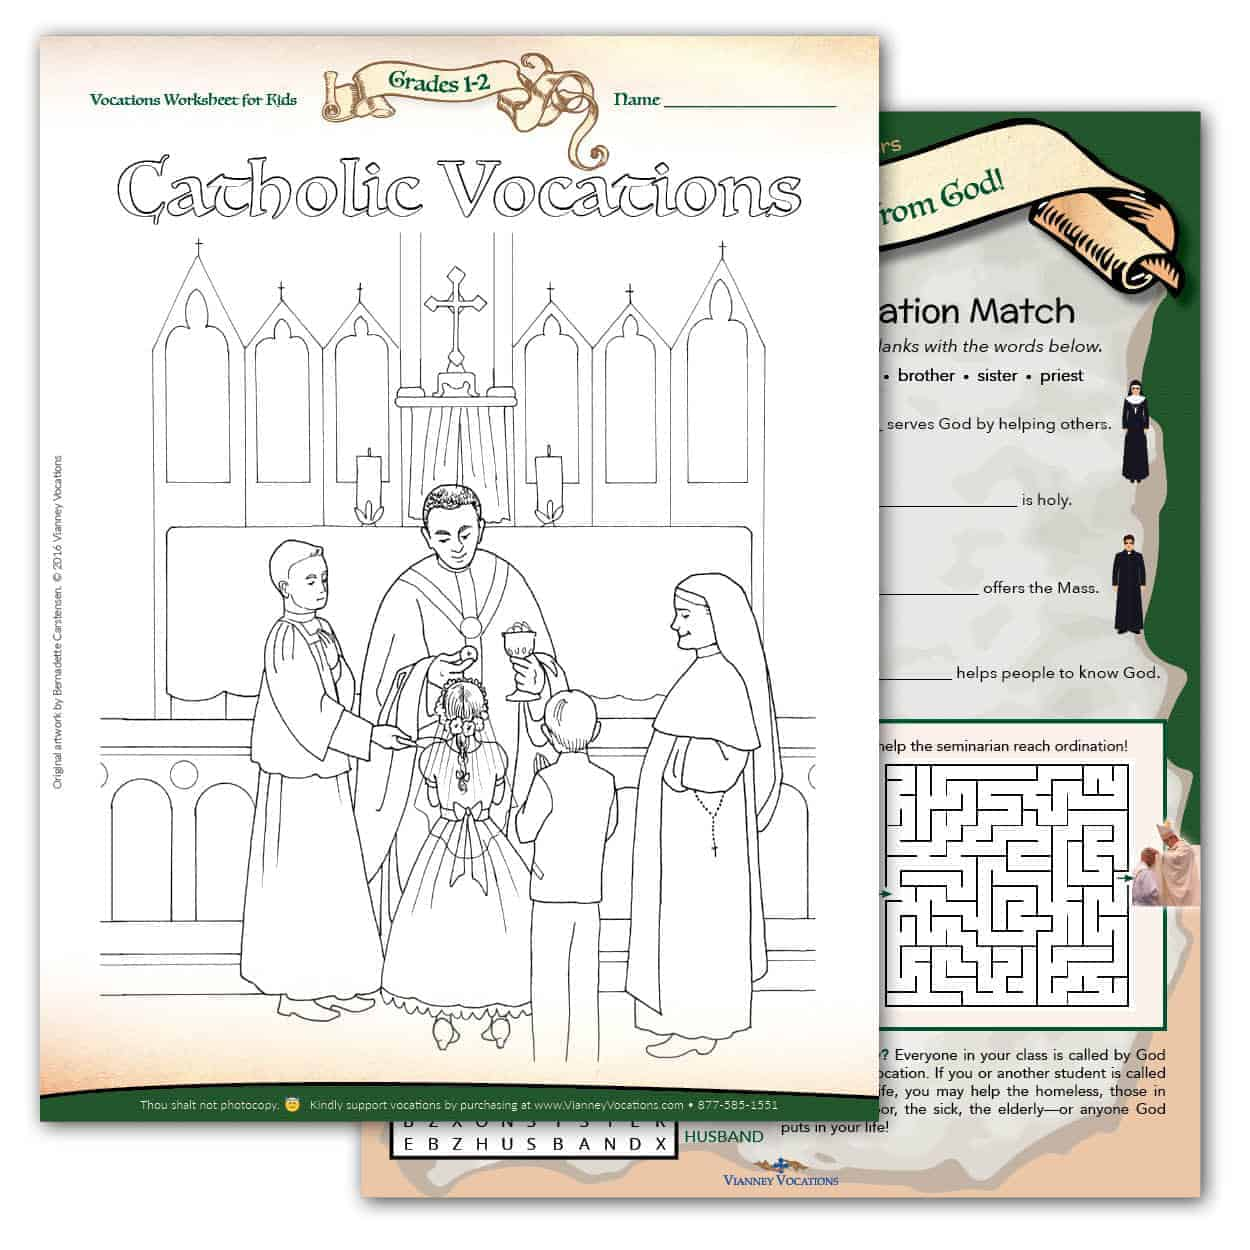 hight resolution of Vocations Worksheet for Kids - Grades 1-2 - Vianney Vocations